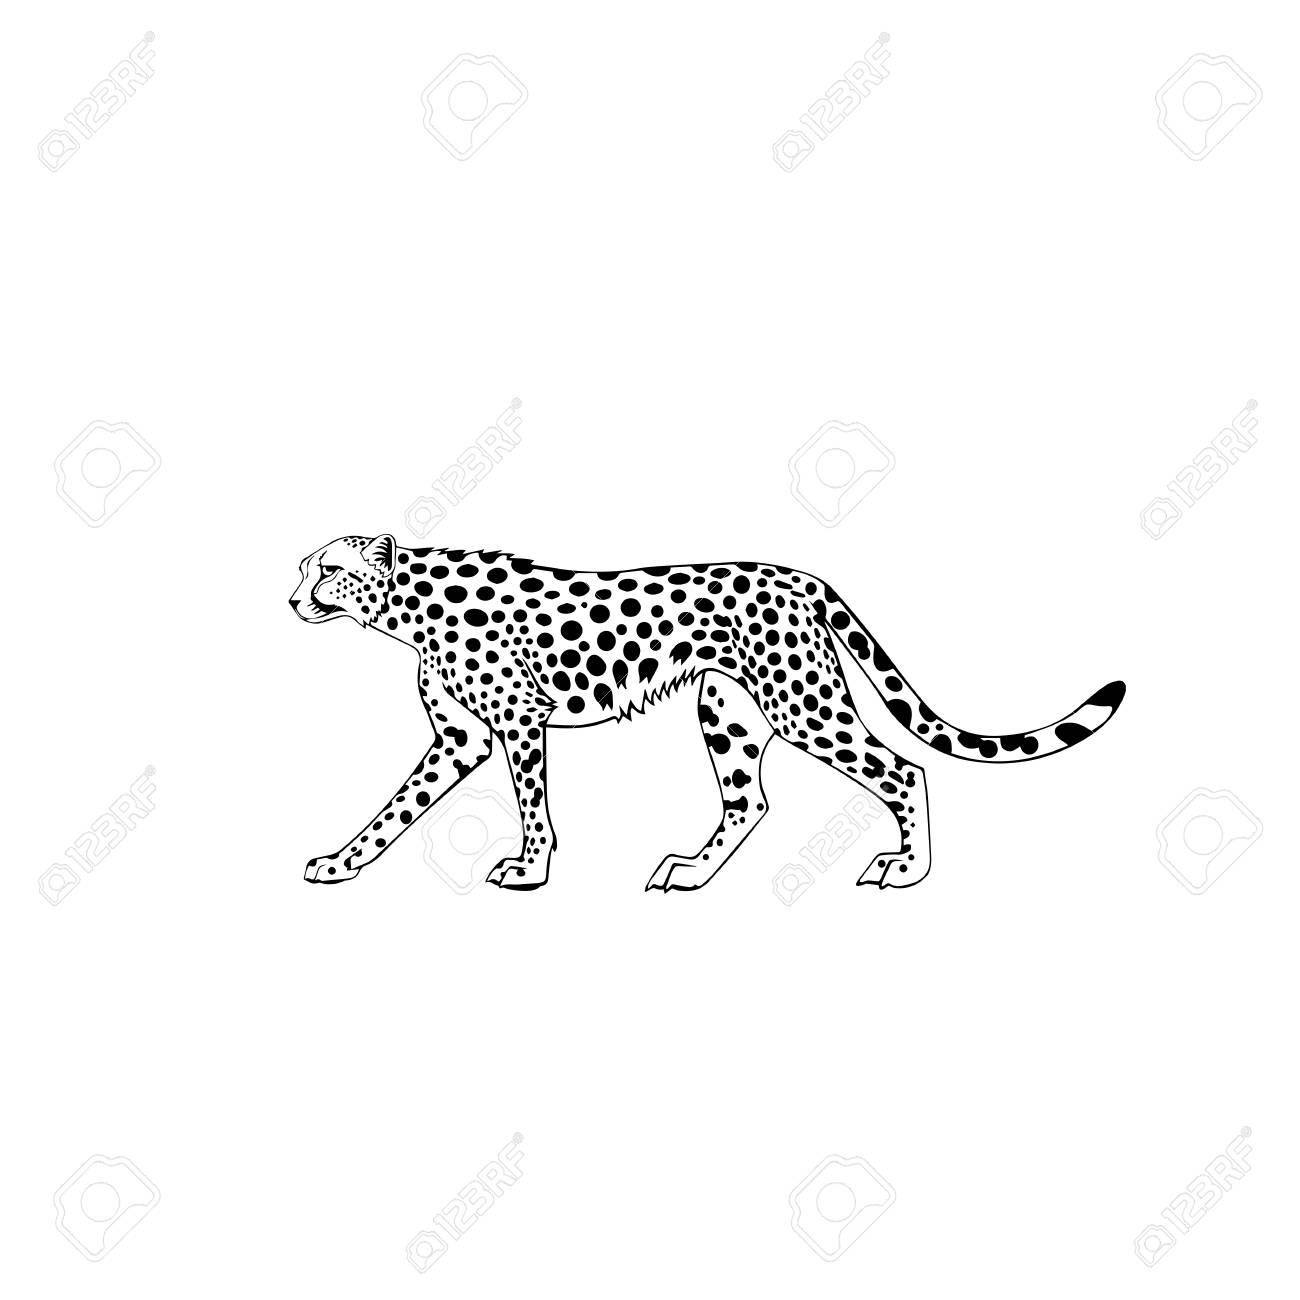 Cheetah Tattoo Design Royalty Free Cliparts Vectors And Stock Illustration Image 77529170